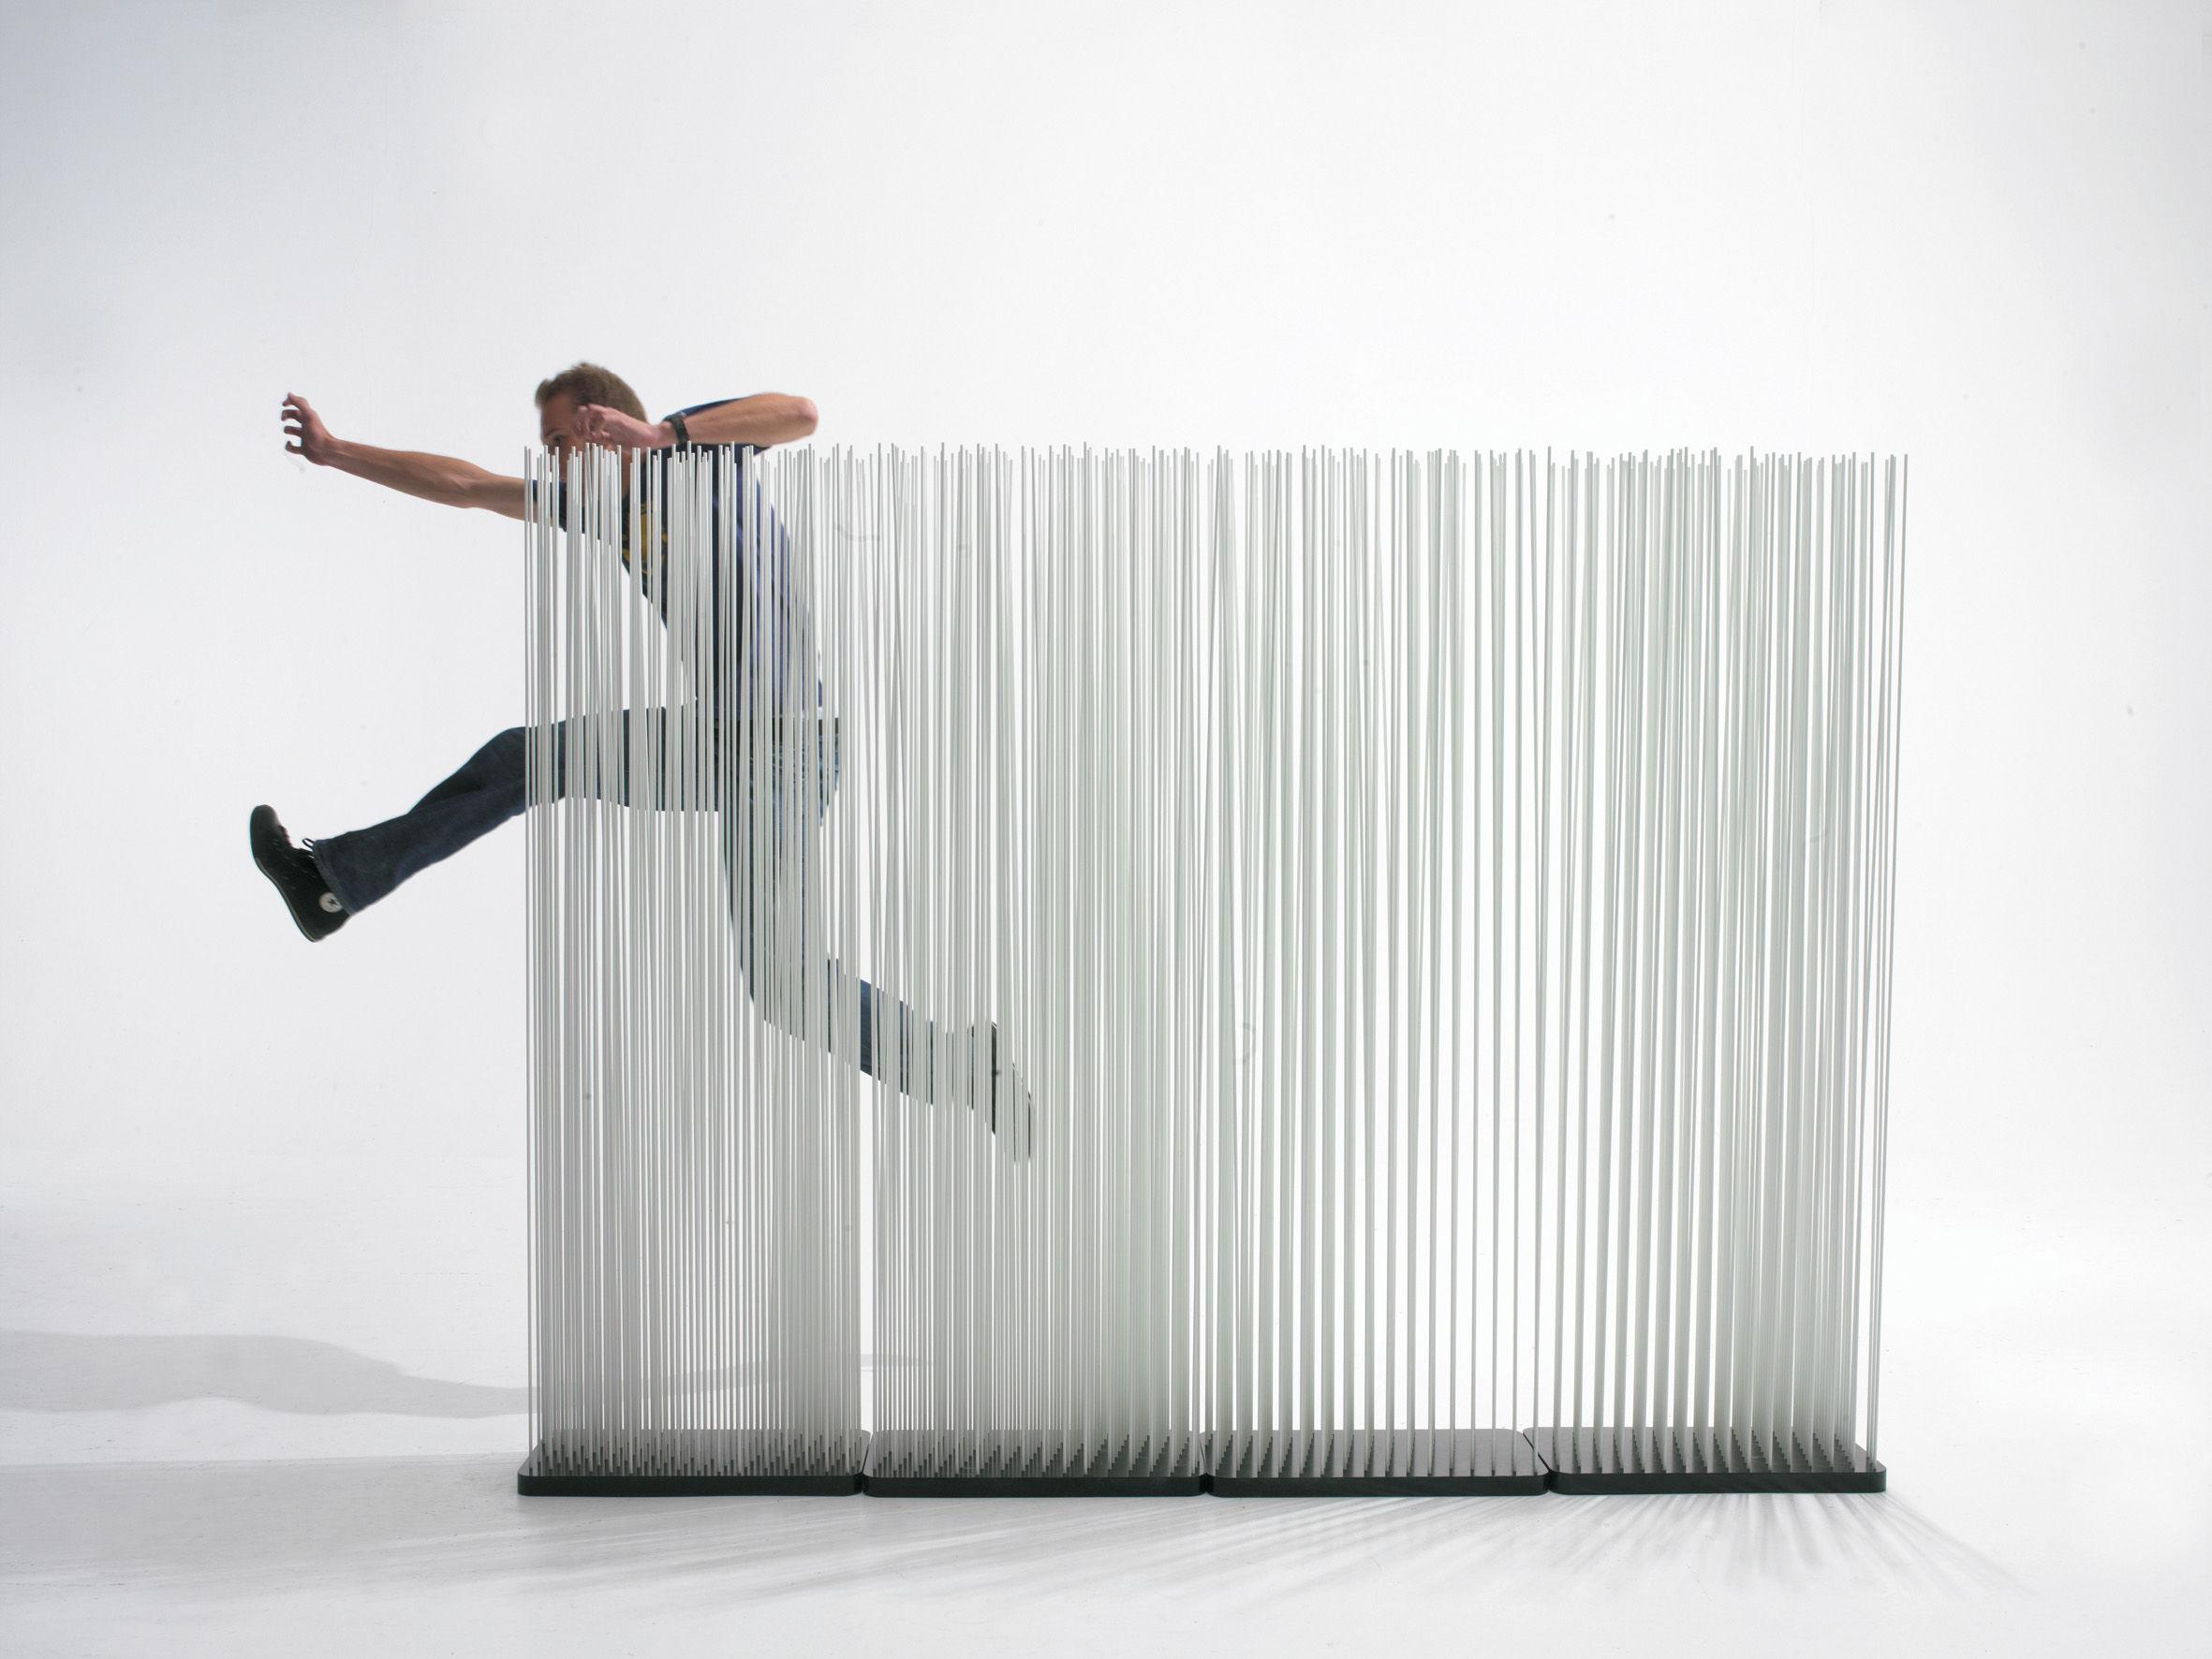 sticks paravent l 60 x h 120 cm f r au en h 120 cm. Black Bedroom Furniture Sets. Home Design Ideas